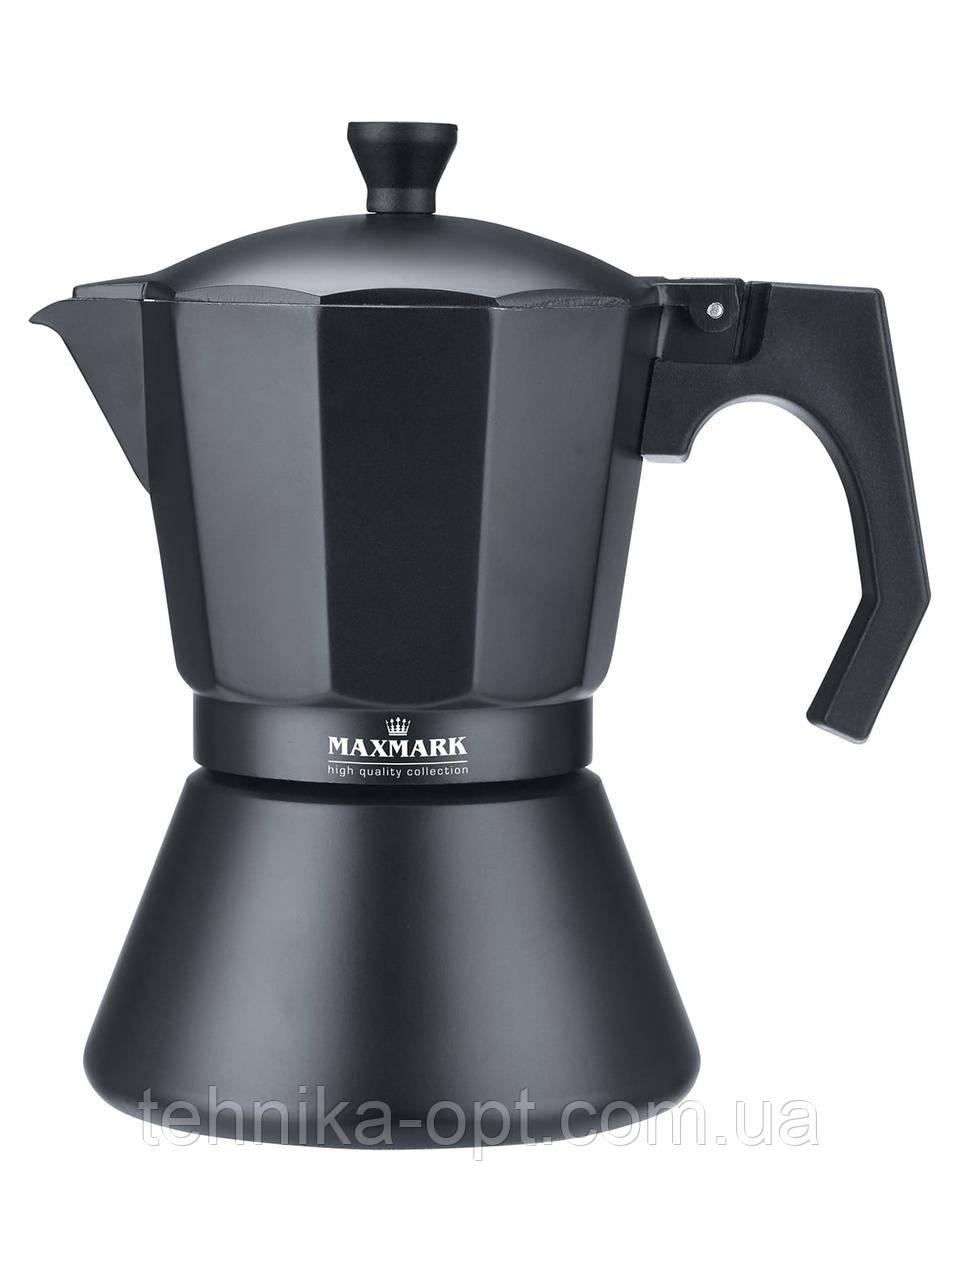 Гейзерная кофеварка Maxmark MK-106BL